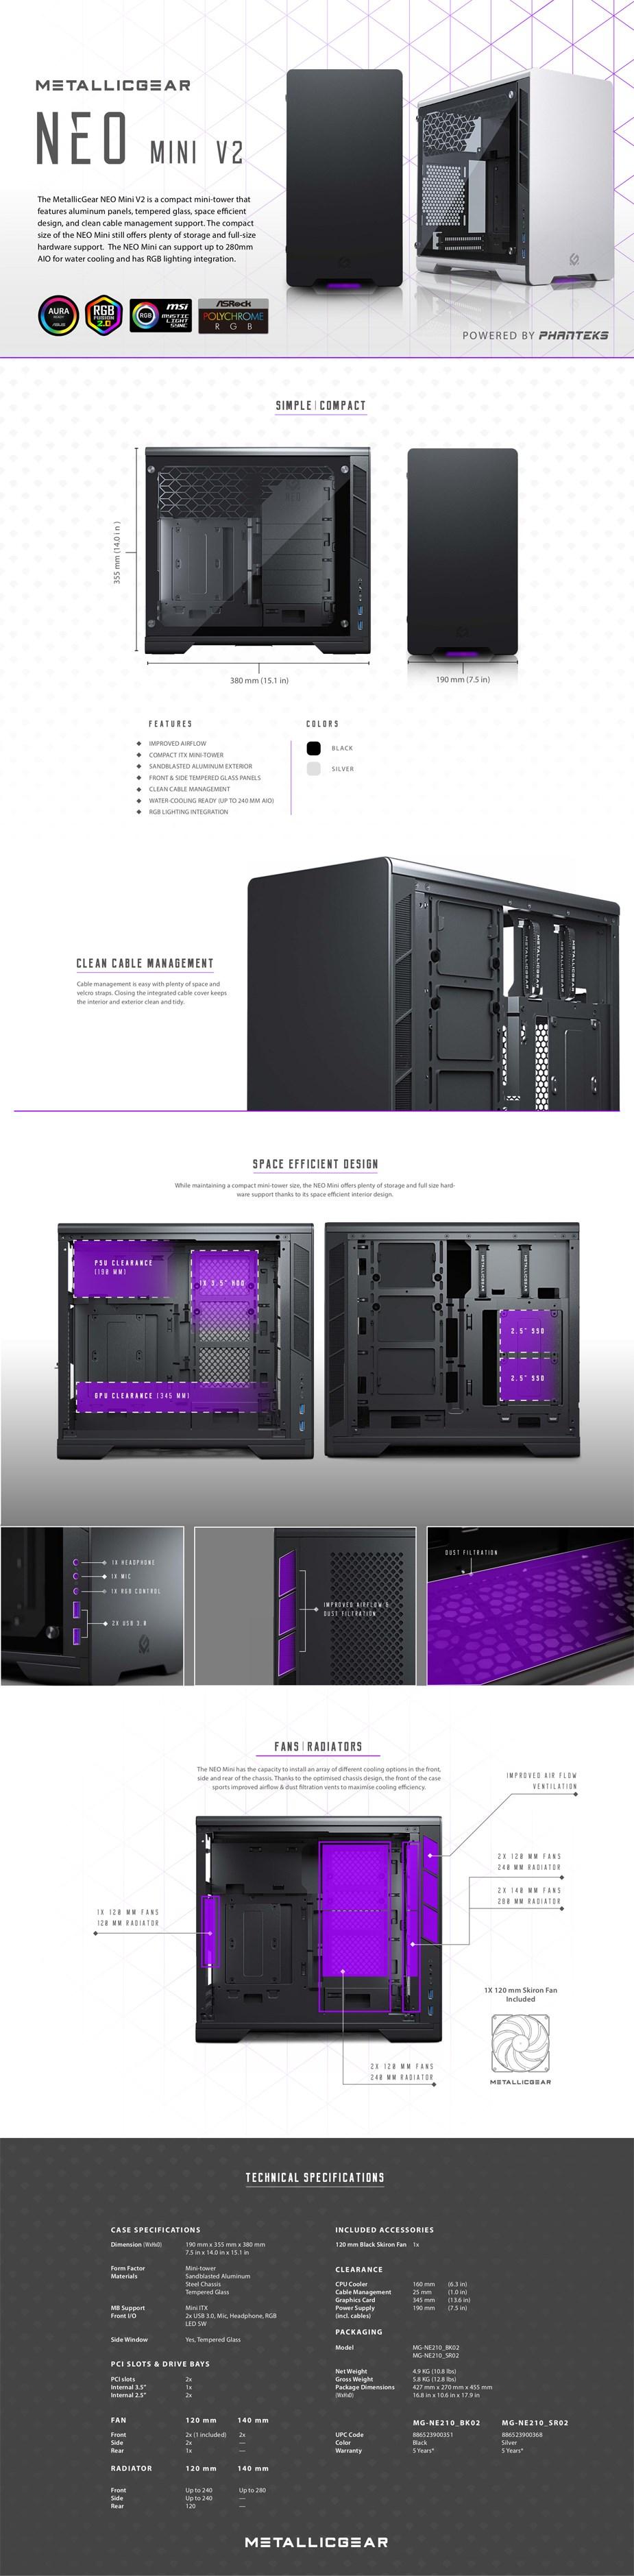 MetallicGear Neo Mini V2 RGB Tempered Glass Mini-Tower Mini-ITX Case - Black - Overview 1